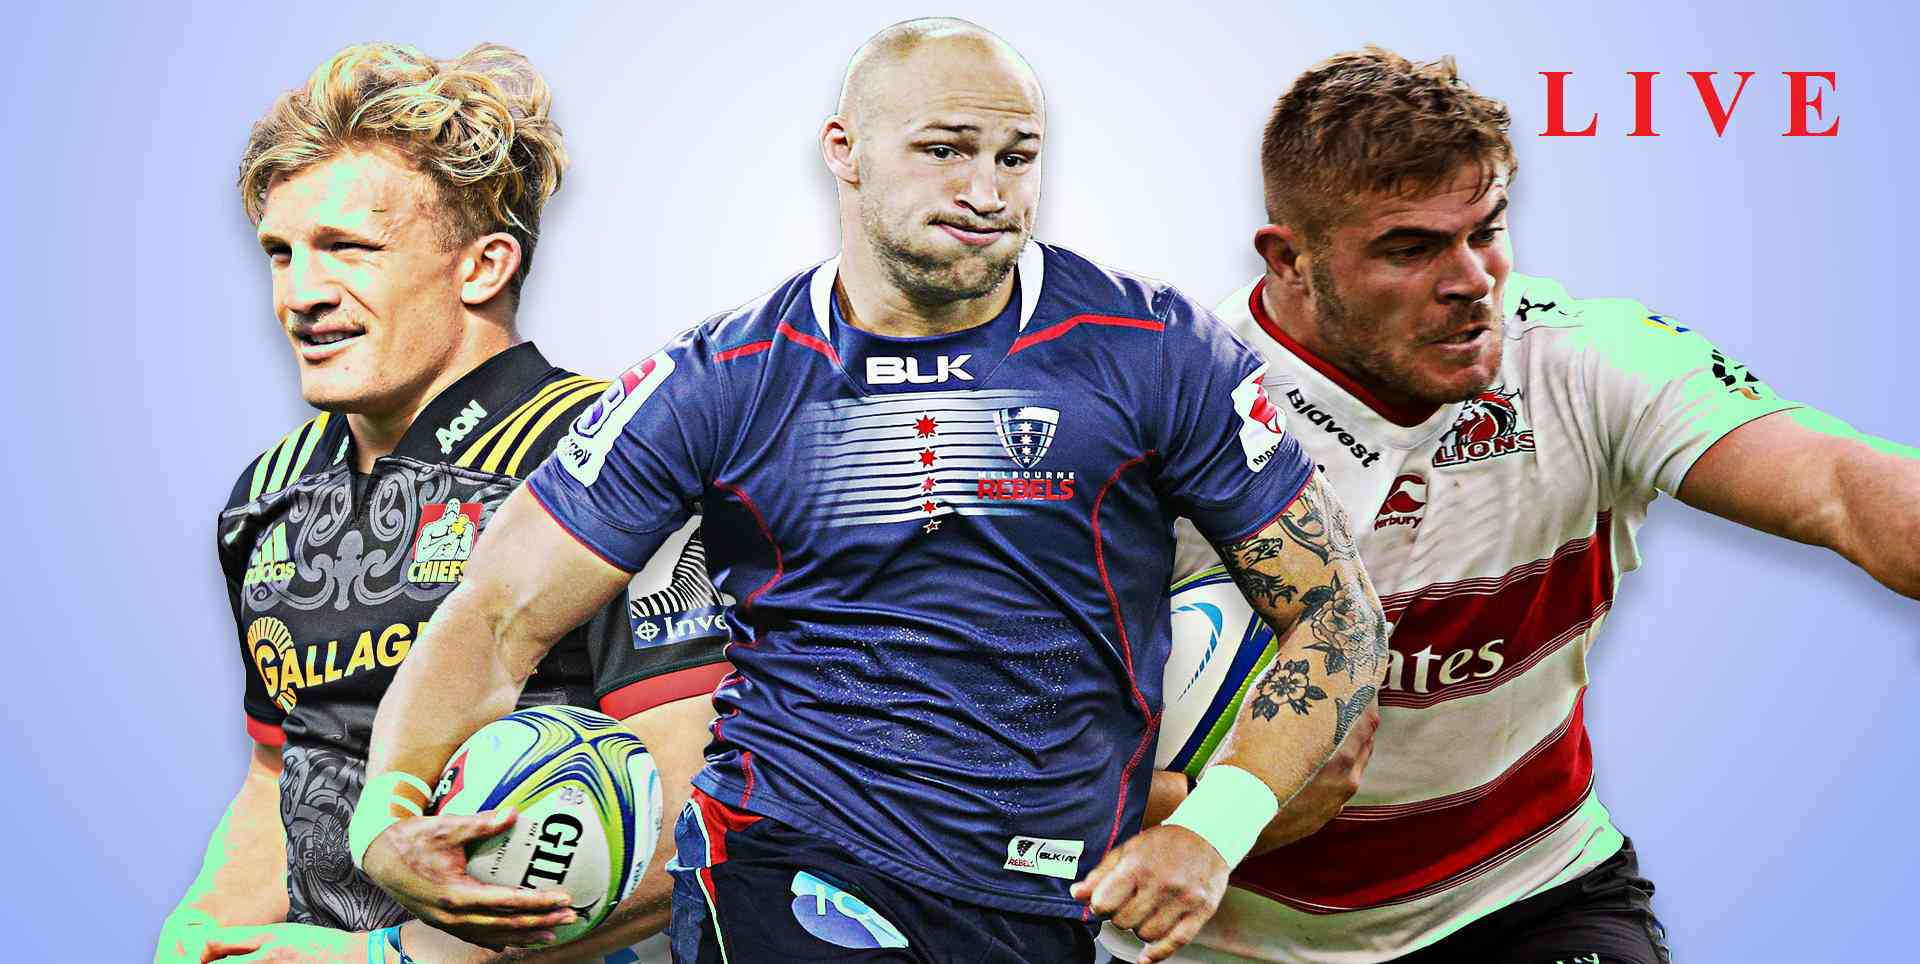 live-rugby-ospreys-vs-stade-francais